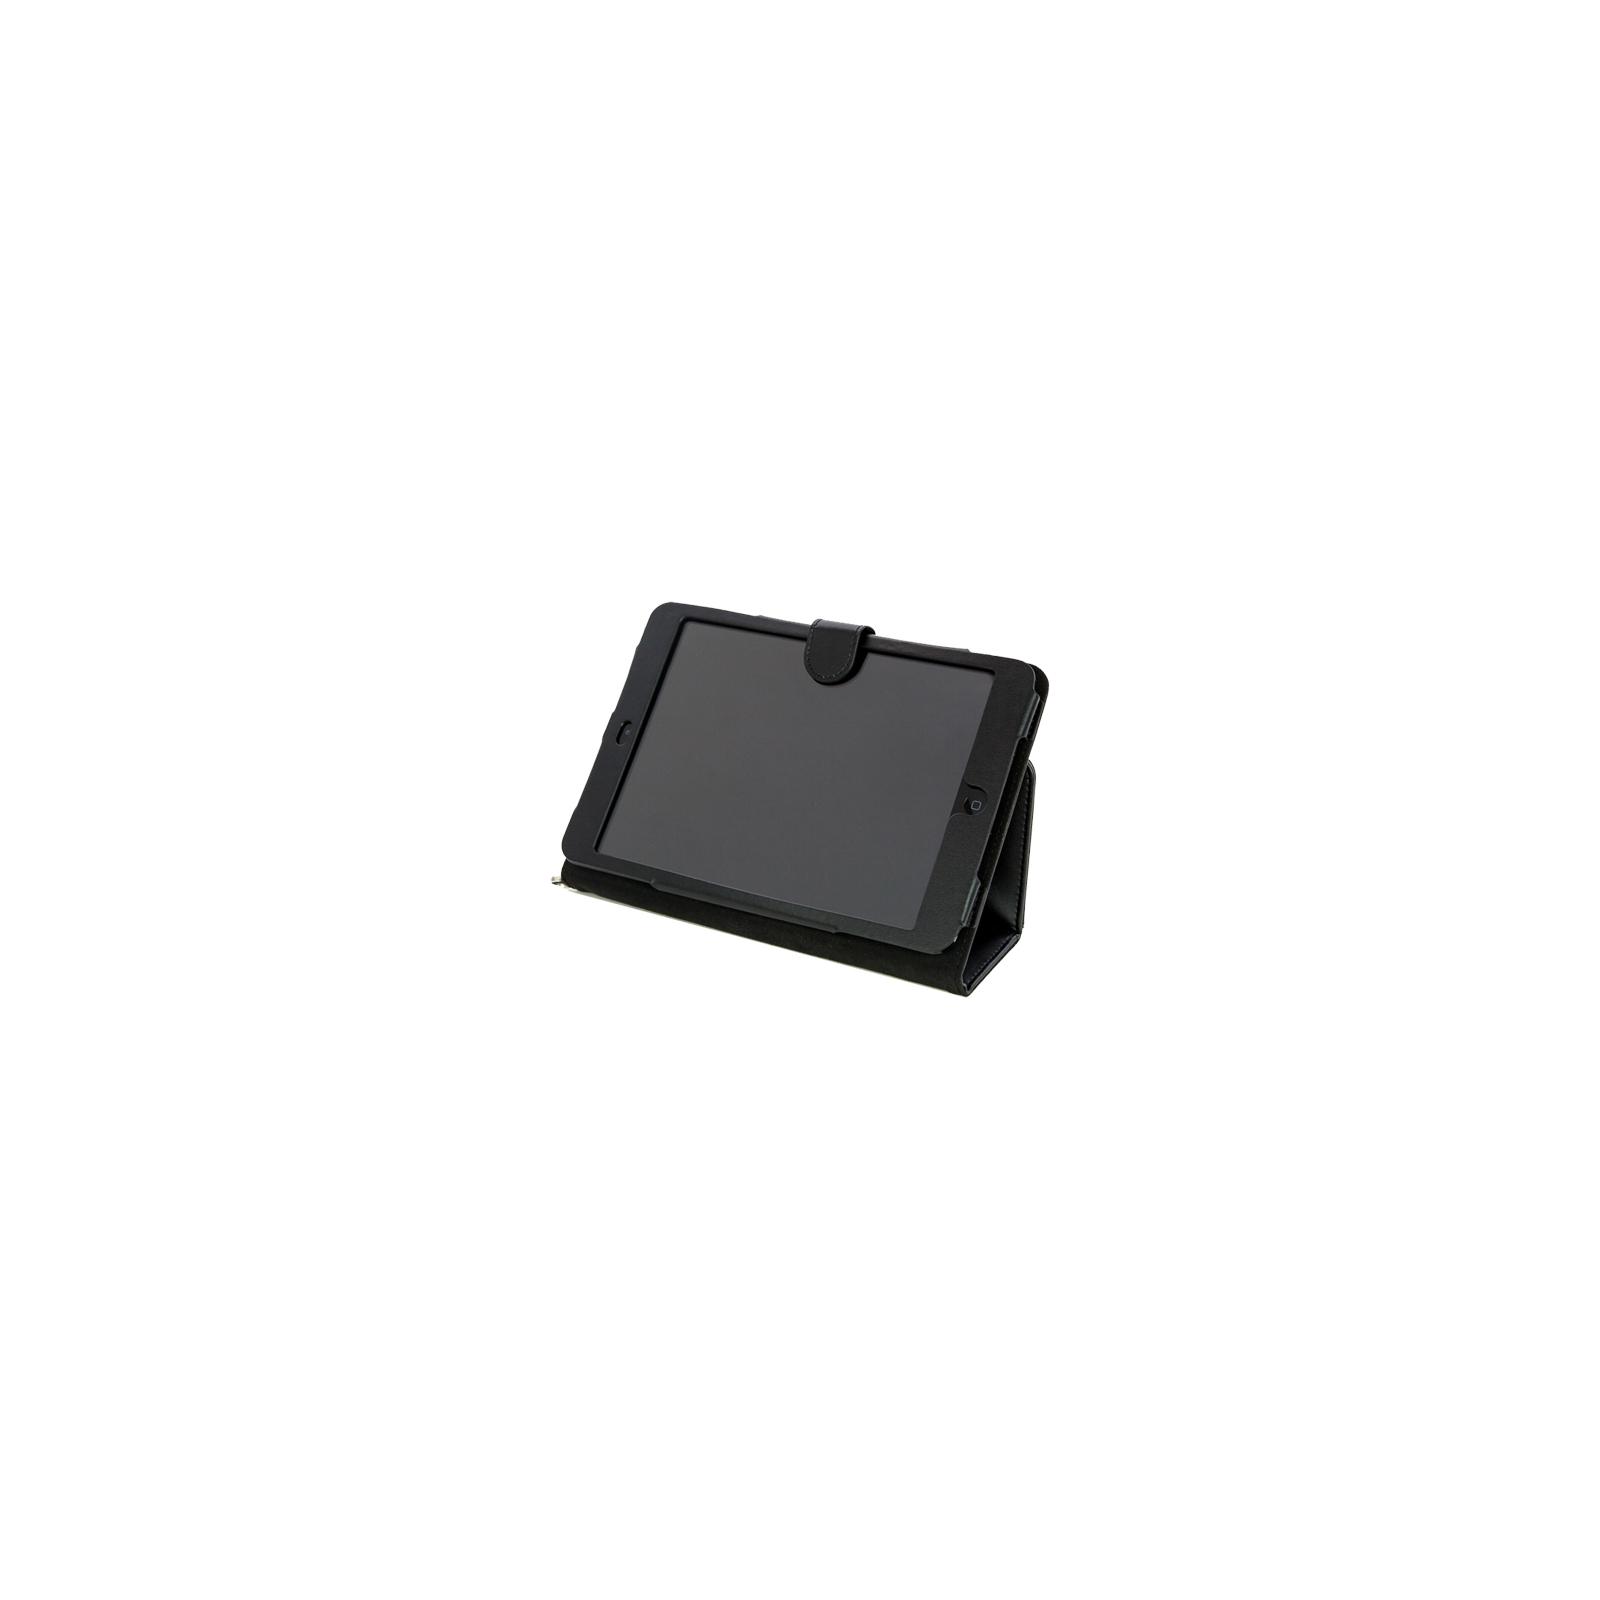 Чехол для планшета ODOYO IPAD AIR /GENUINE LEATHER FOLIO BLACK (PA536BK) изображение 5